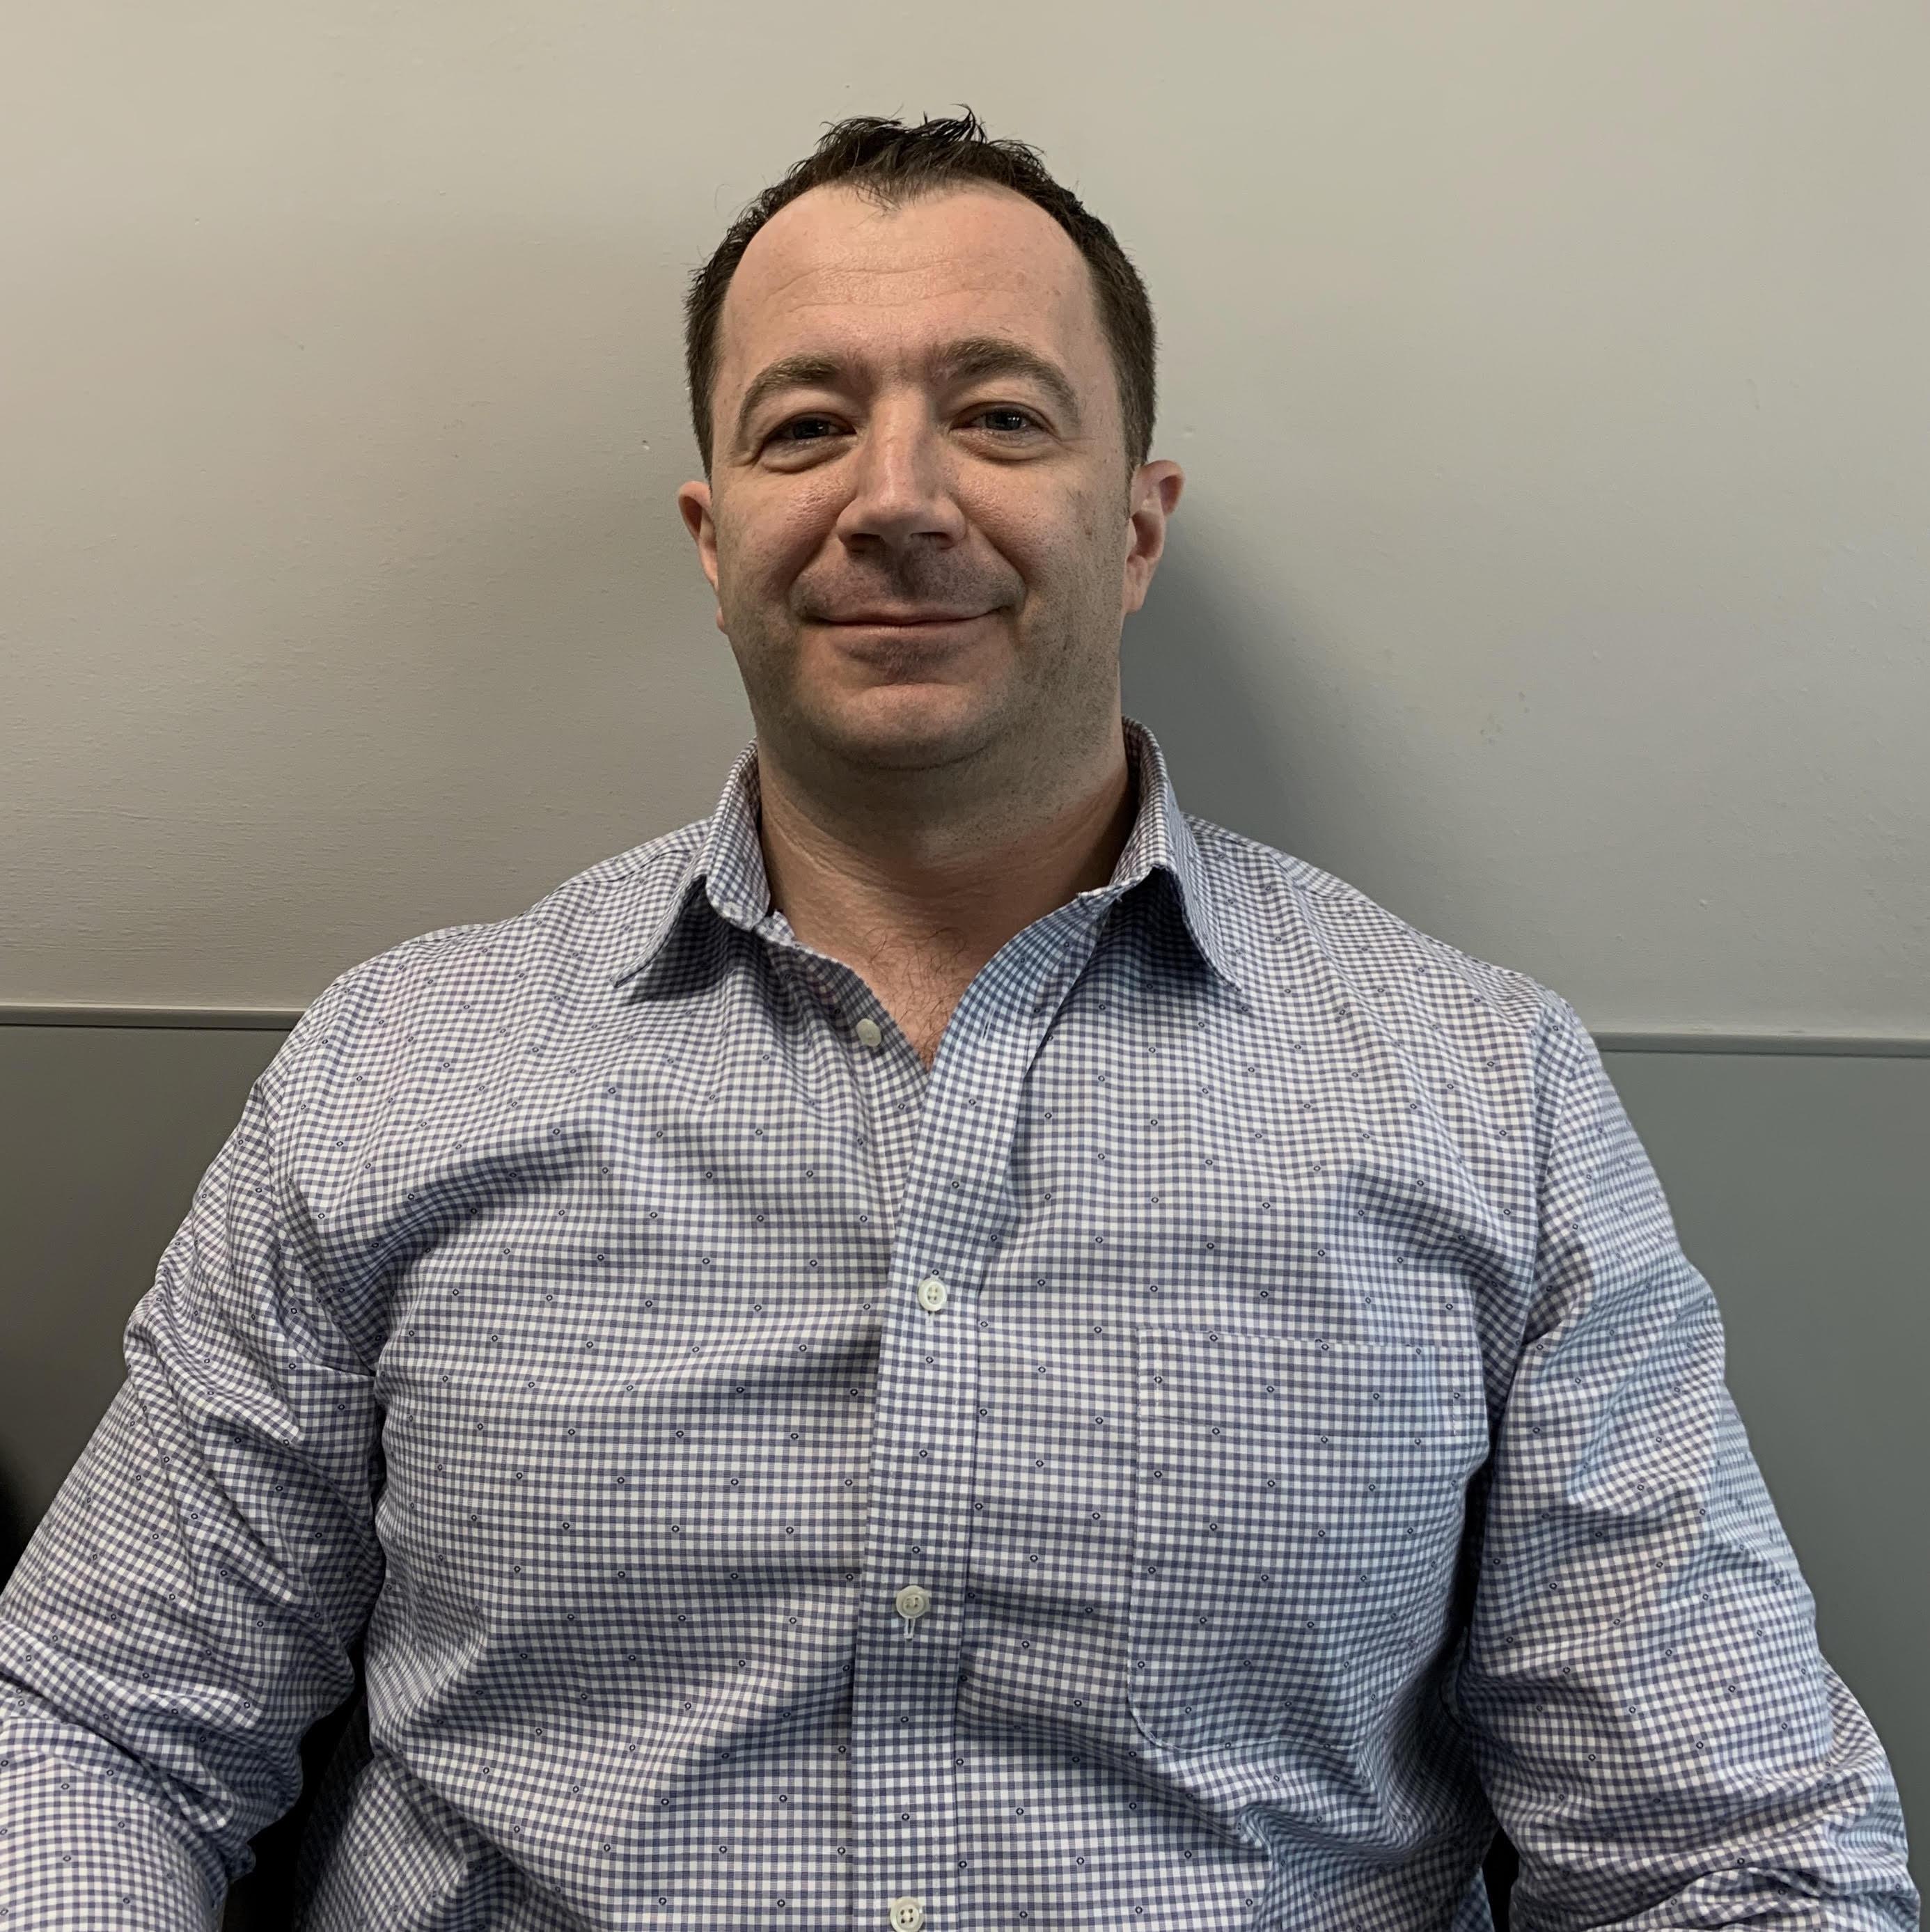 JOE CECCONI''S CHRYSLER COMPLEX NEW CAR DEALERSHIP